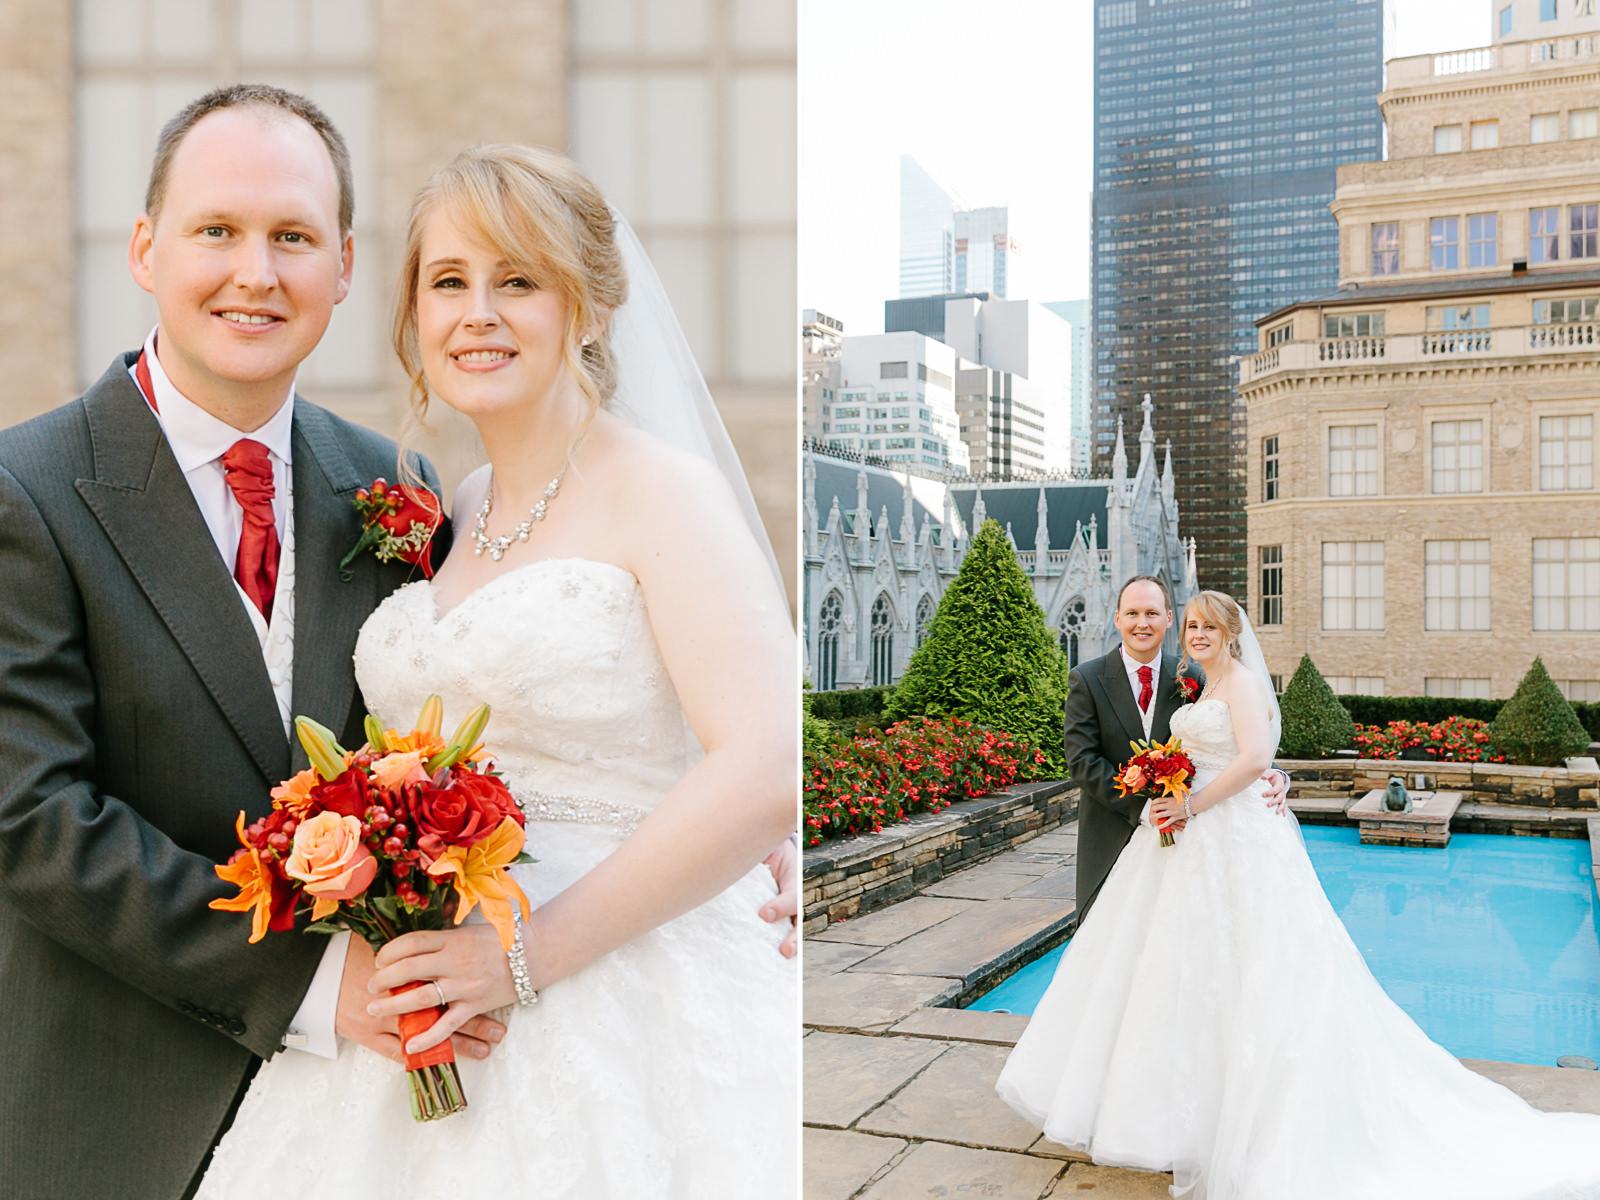 620 Loft&garden-intimate-wedding-9.jpg